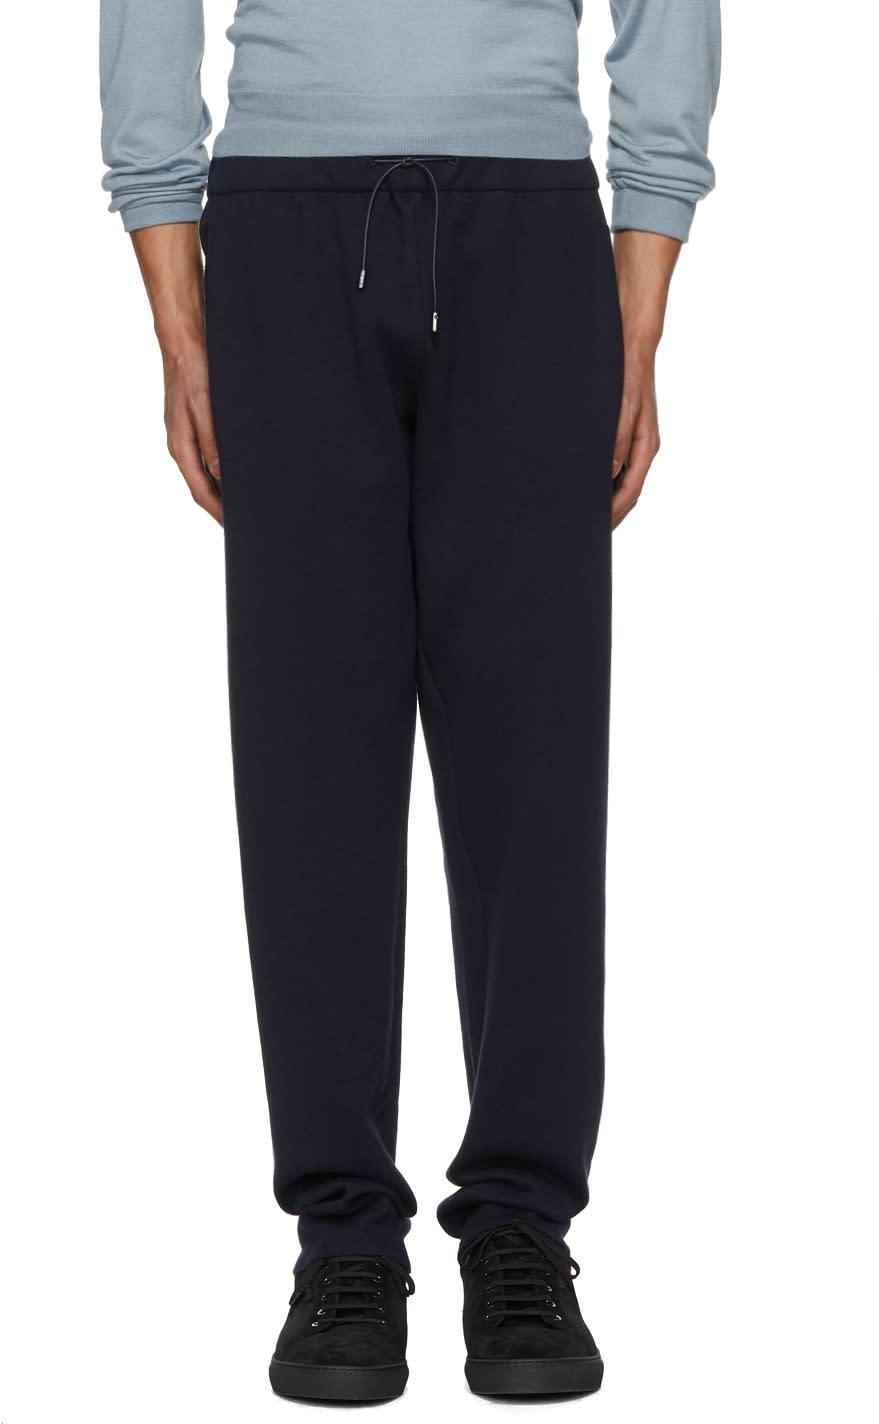 Image of Brioni Blue Cashmere Lounge Pants